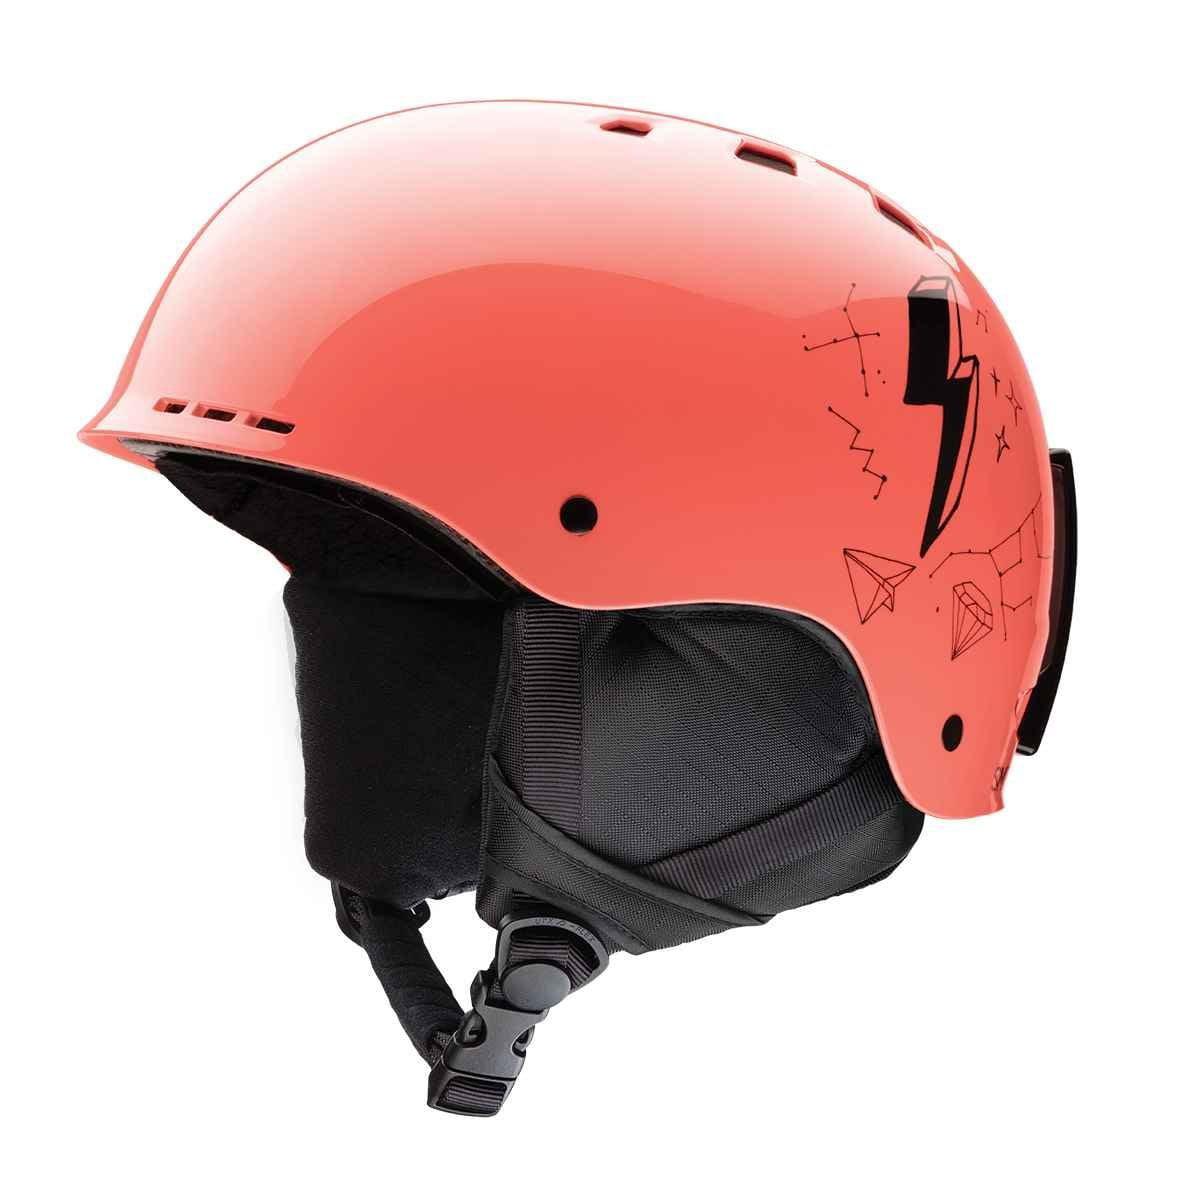 Smith Optics Holt Jr Ski Snow Helmet (Sunburst Doodles Youth Small) by Smith Optics